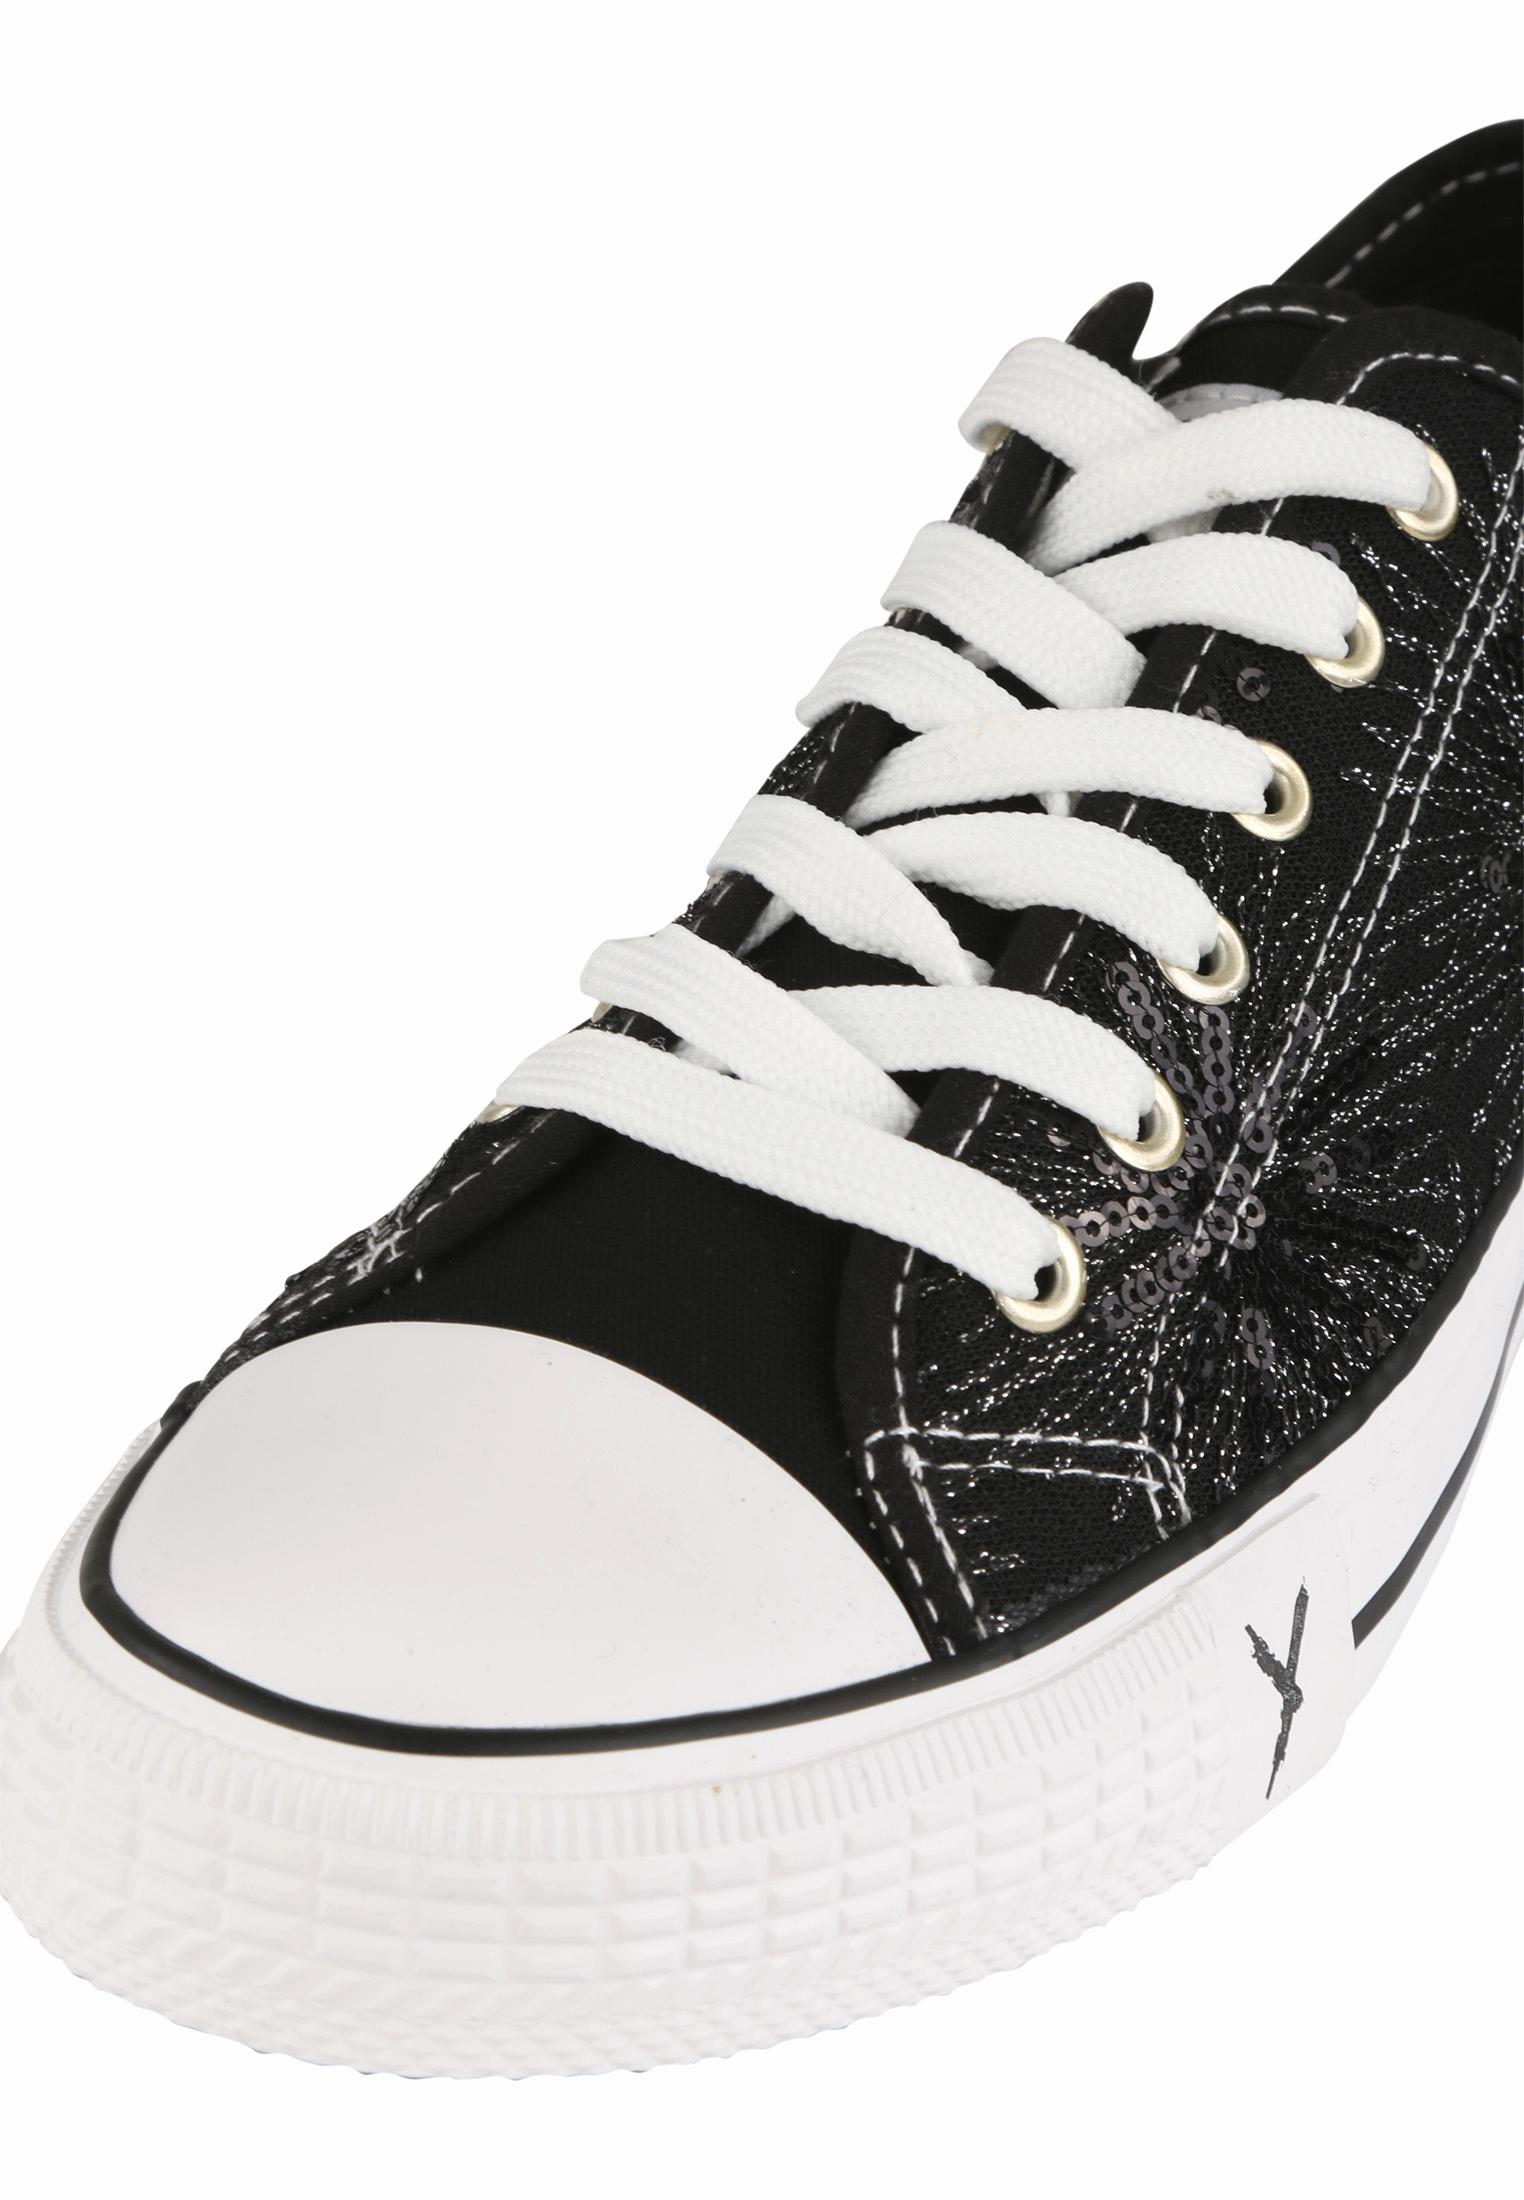 Walking feet shoes clipart aerial png royalty free stock Sneaker Clip Art Elegant Sneaker Suzy No 1 Sneaker Schuhe ... png royalty free stock